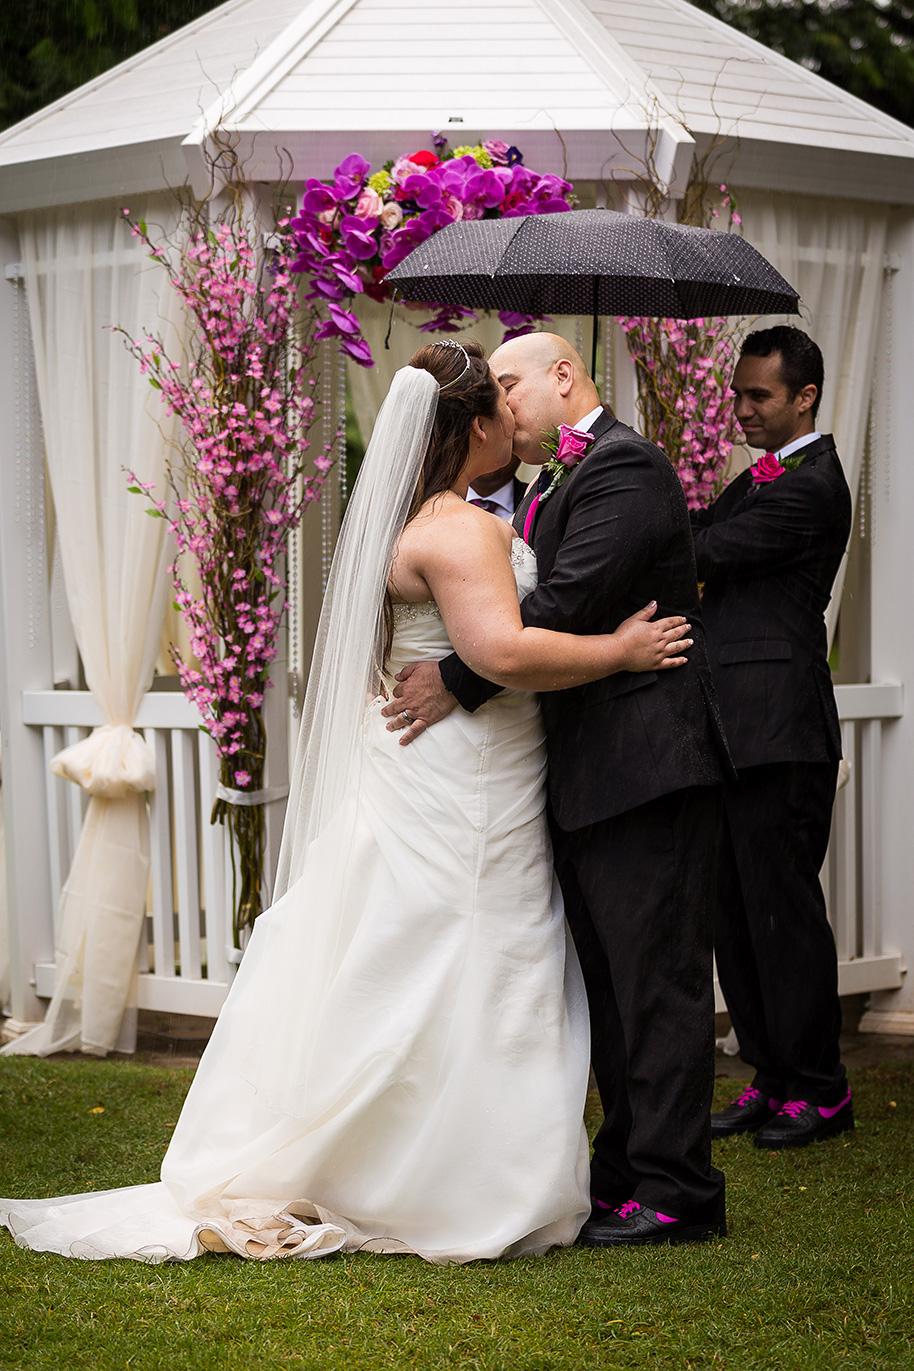 Star-Wars-Wedding-040116-26